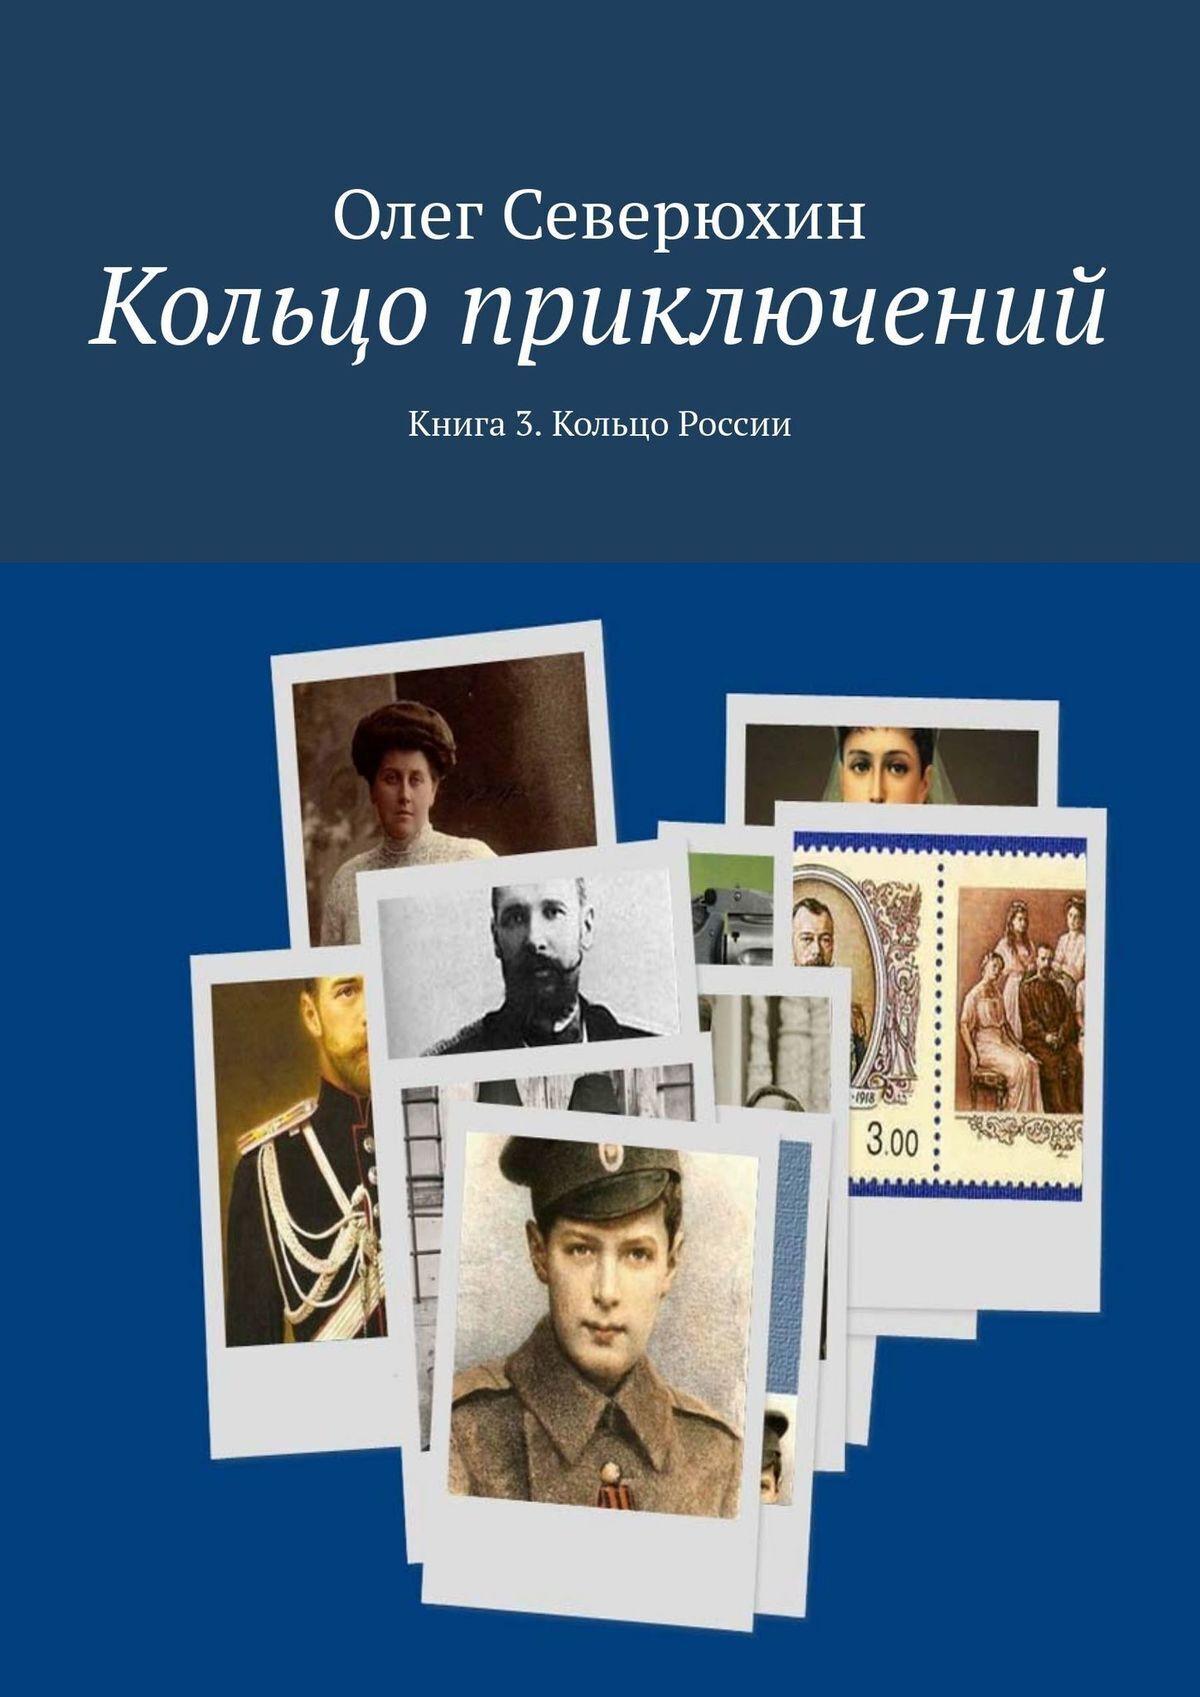 Олег Васильевич Северюхин Кольцо приключений. Книга 3. Кольцо России цена